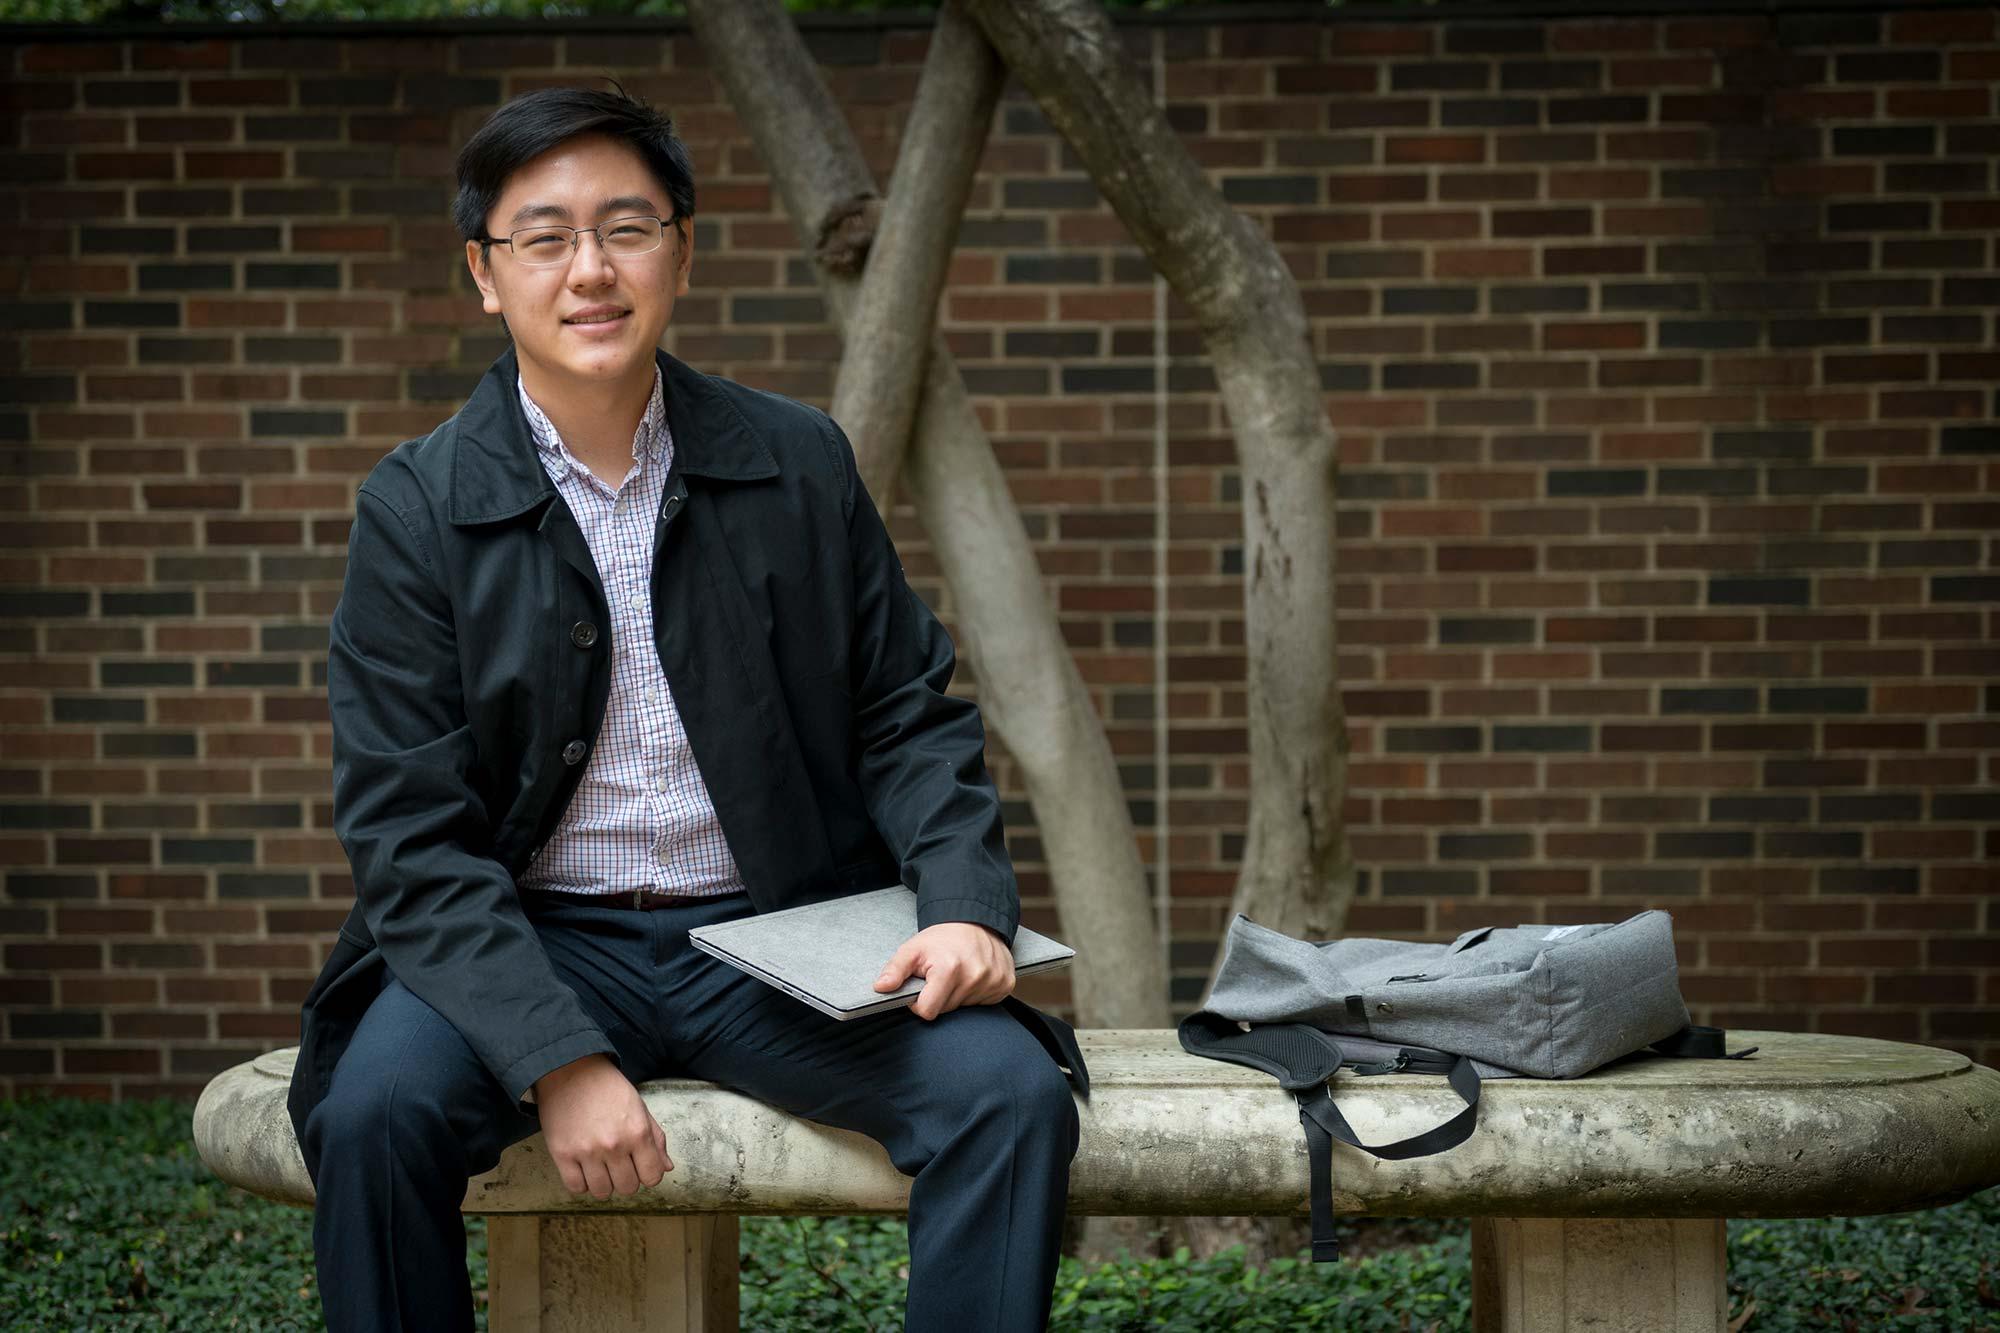 International health advocate: Ben Chi '18